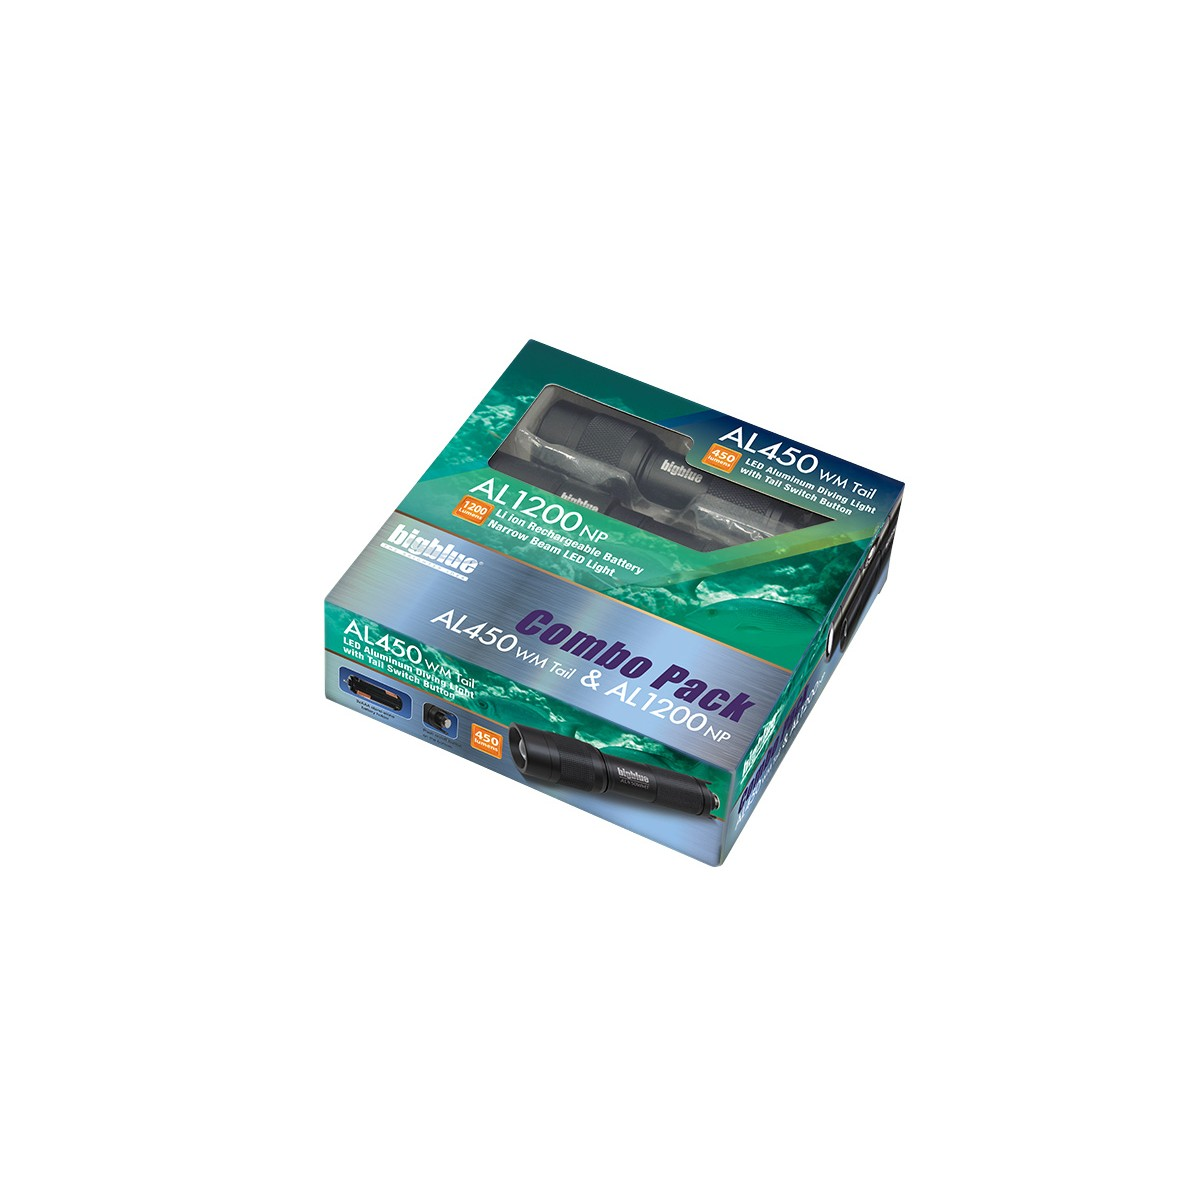 Bigblue Como Pack AL1200NP and AL450WM-Tail Switch